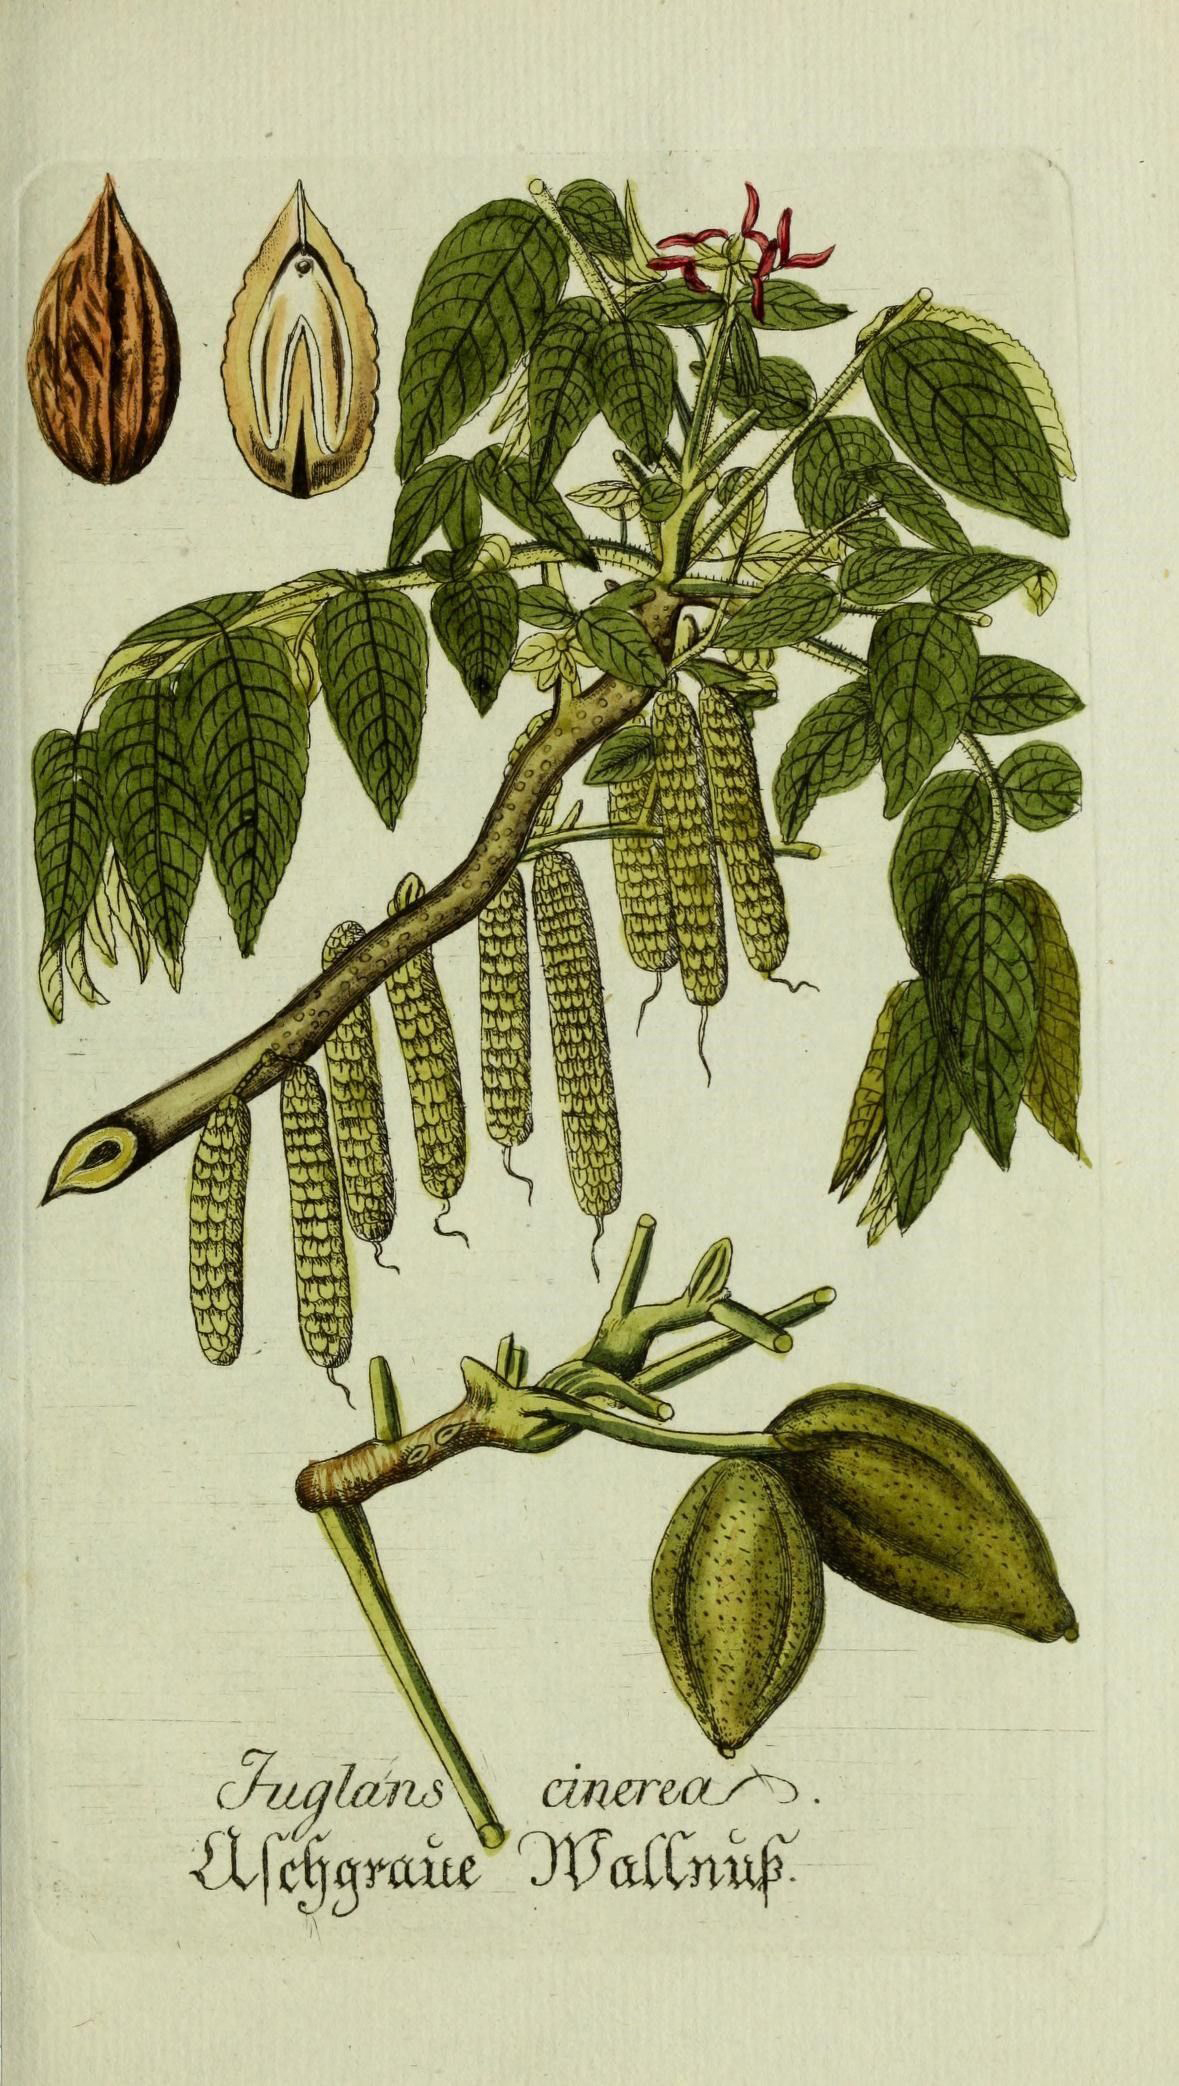 Illustration-of-Butternut